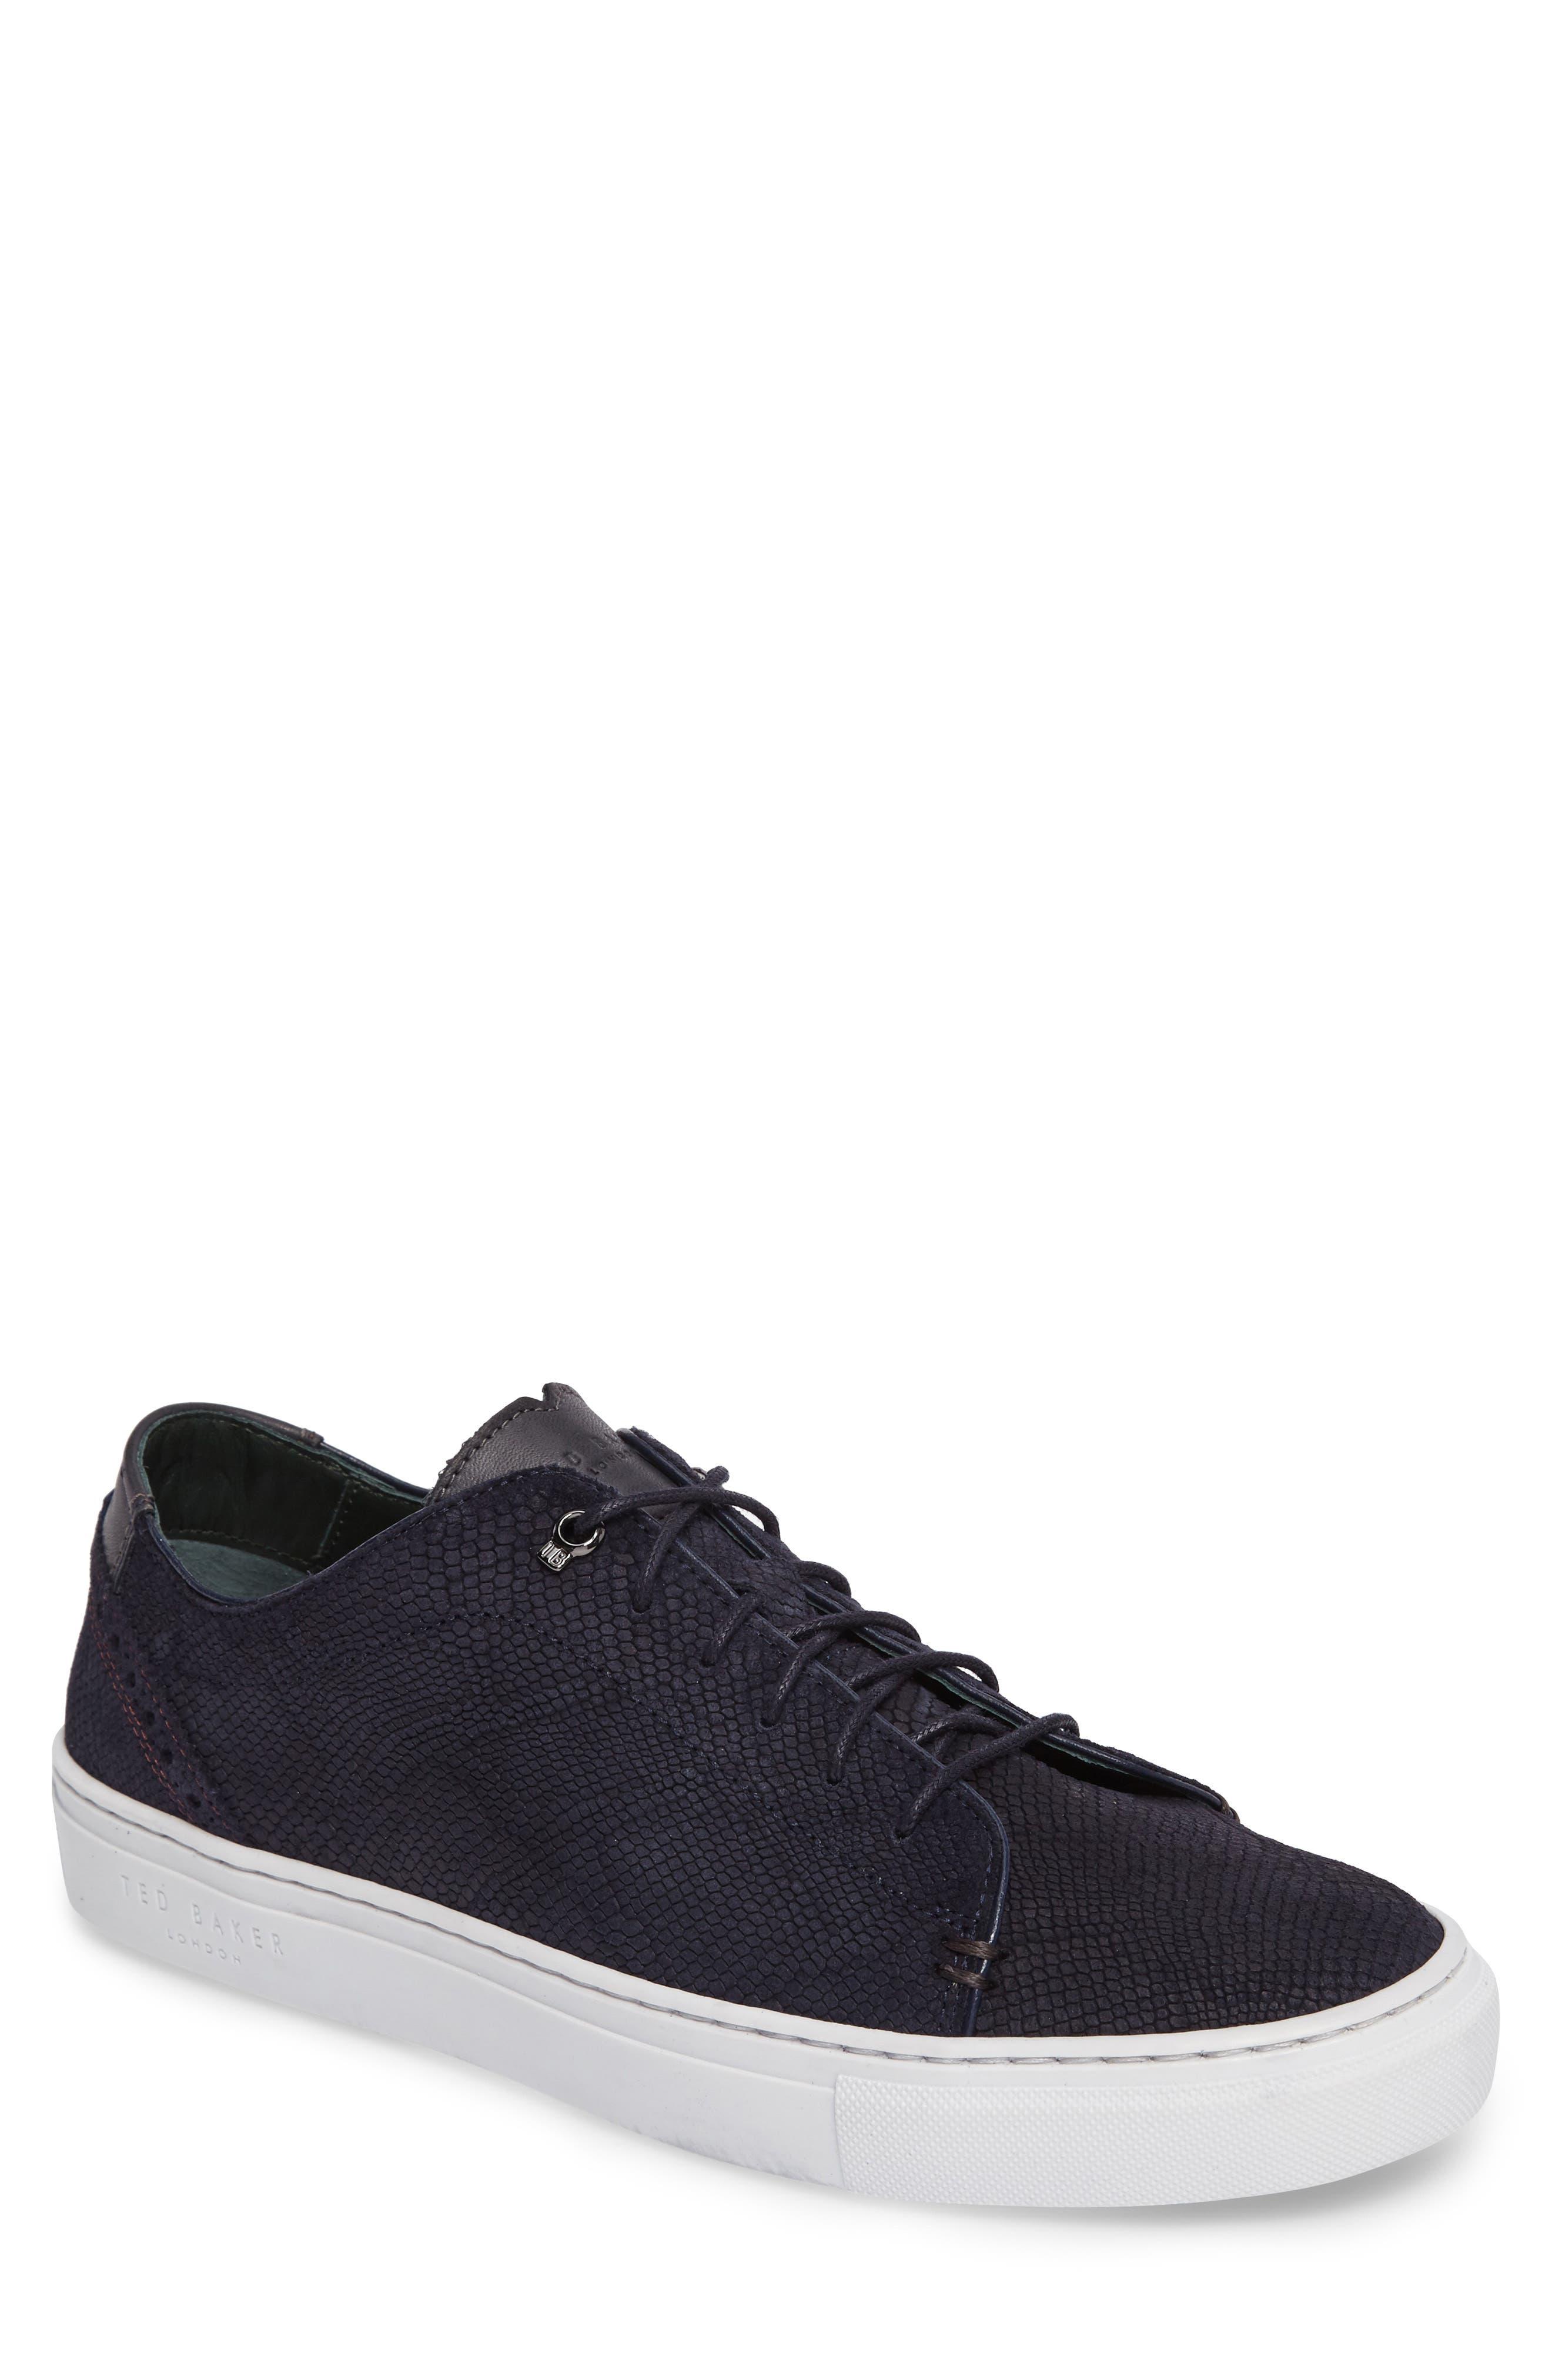 Duuke Sneaker,                             Main thumbnail 1, color,                             Dark Blue Suede